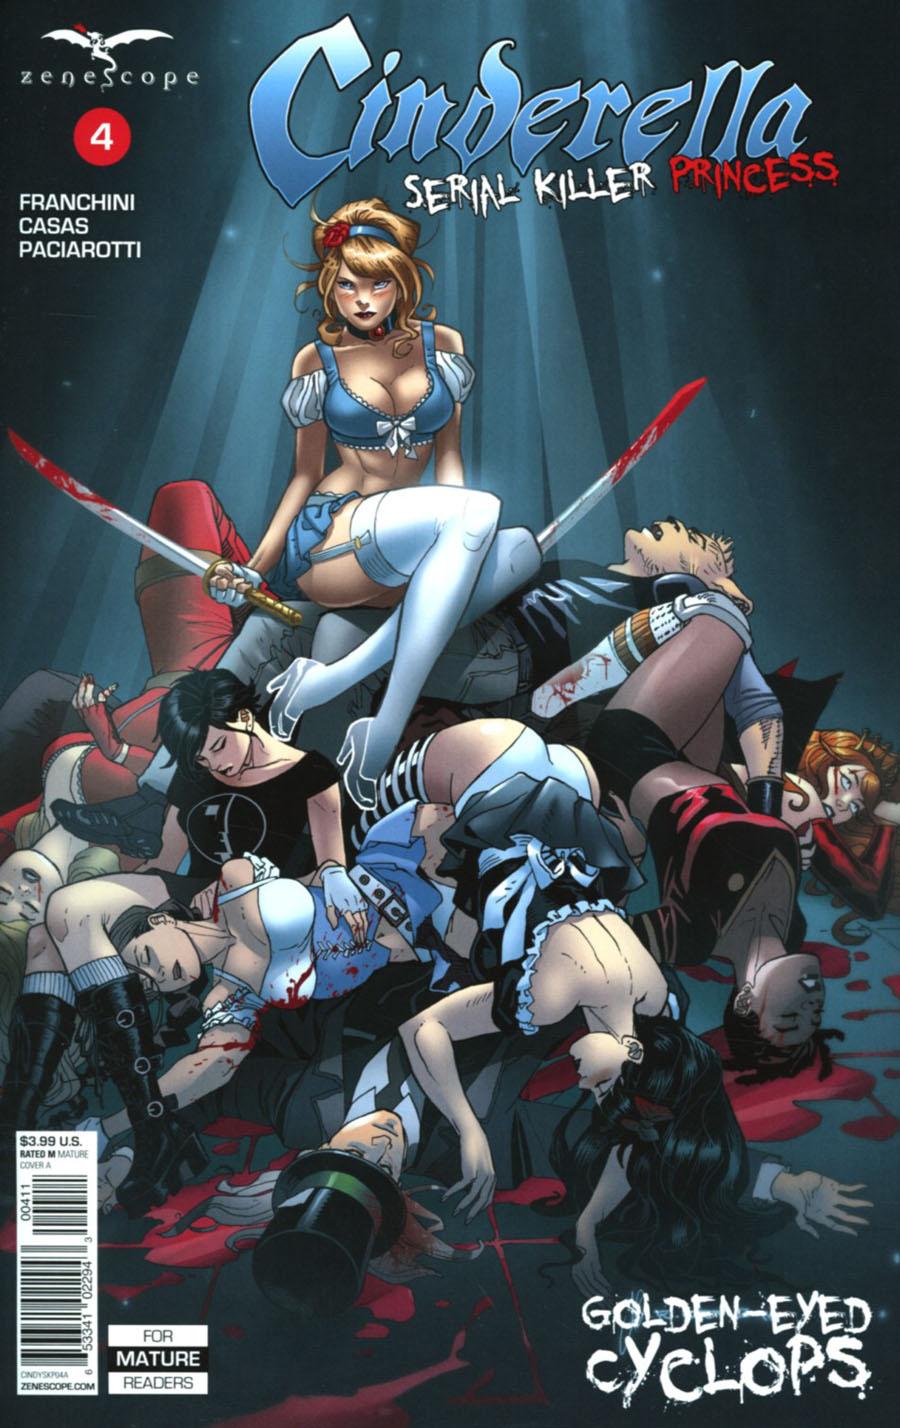 Grimm Fairy Tales Presents Cinderella Serial Killer Princess #4 Cover A Richard Ortiz